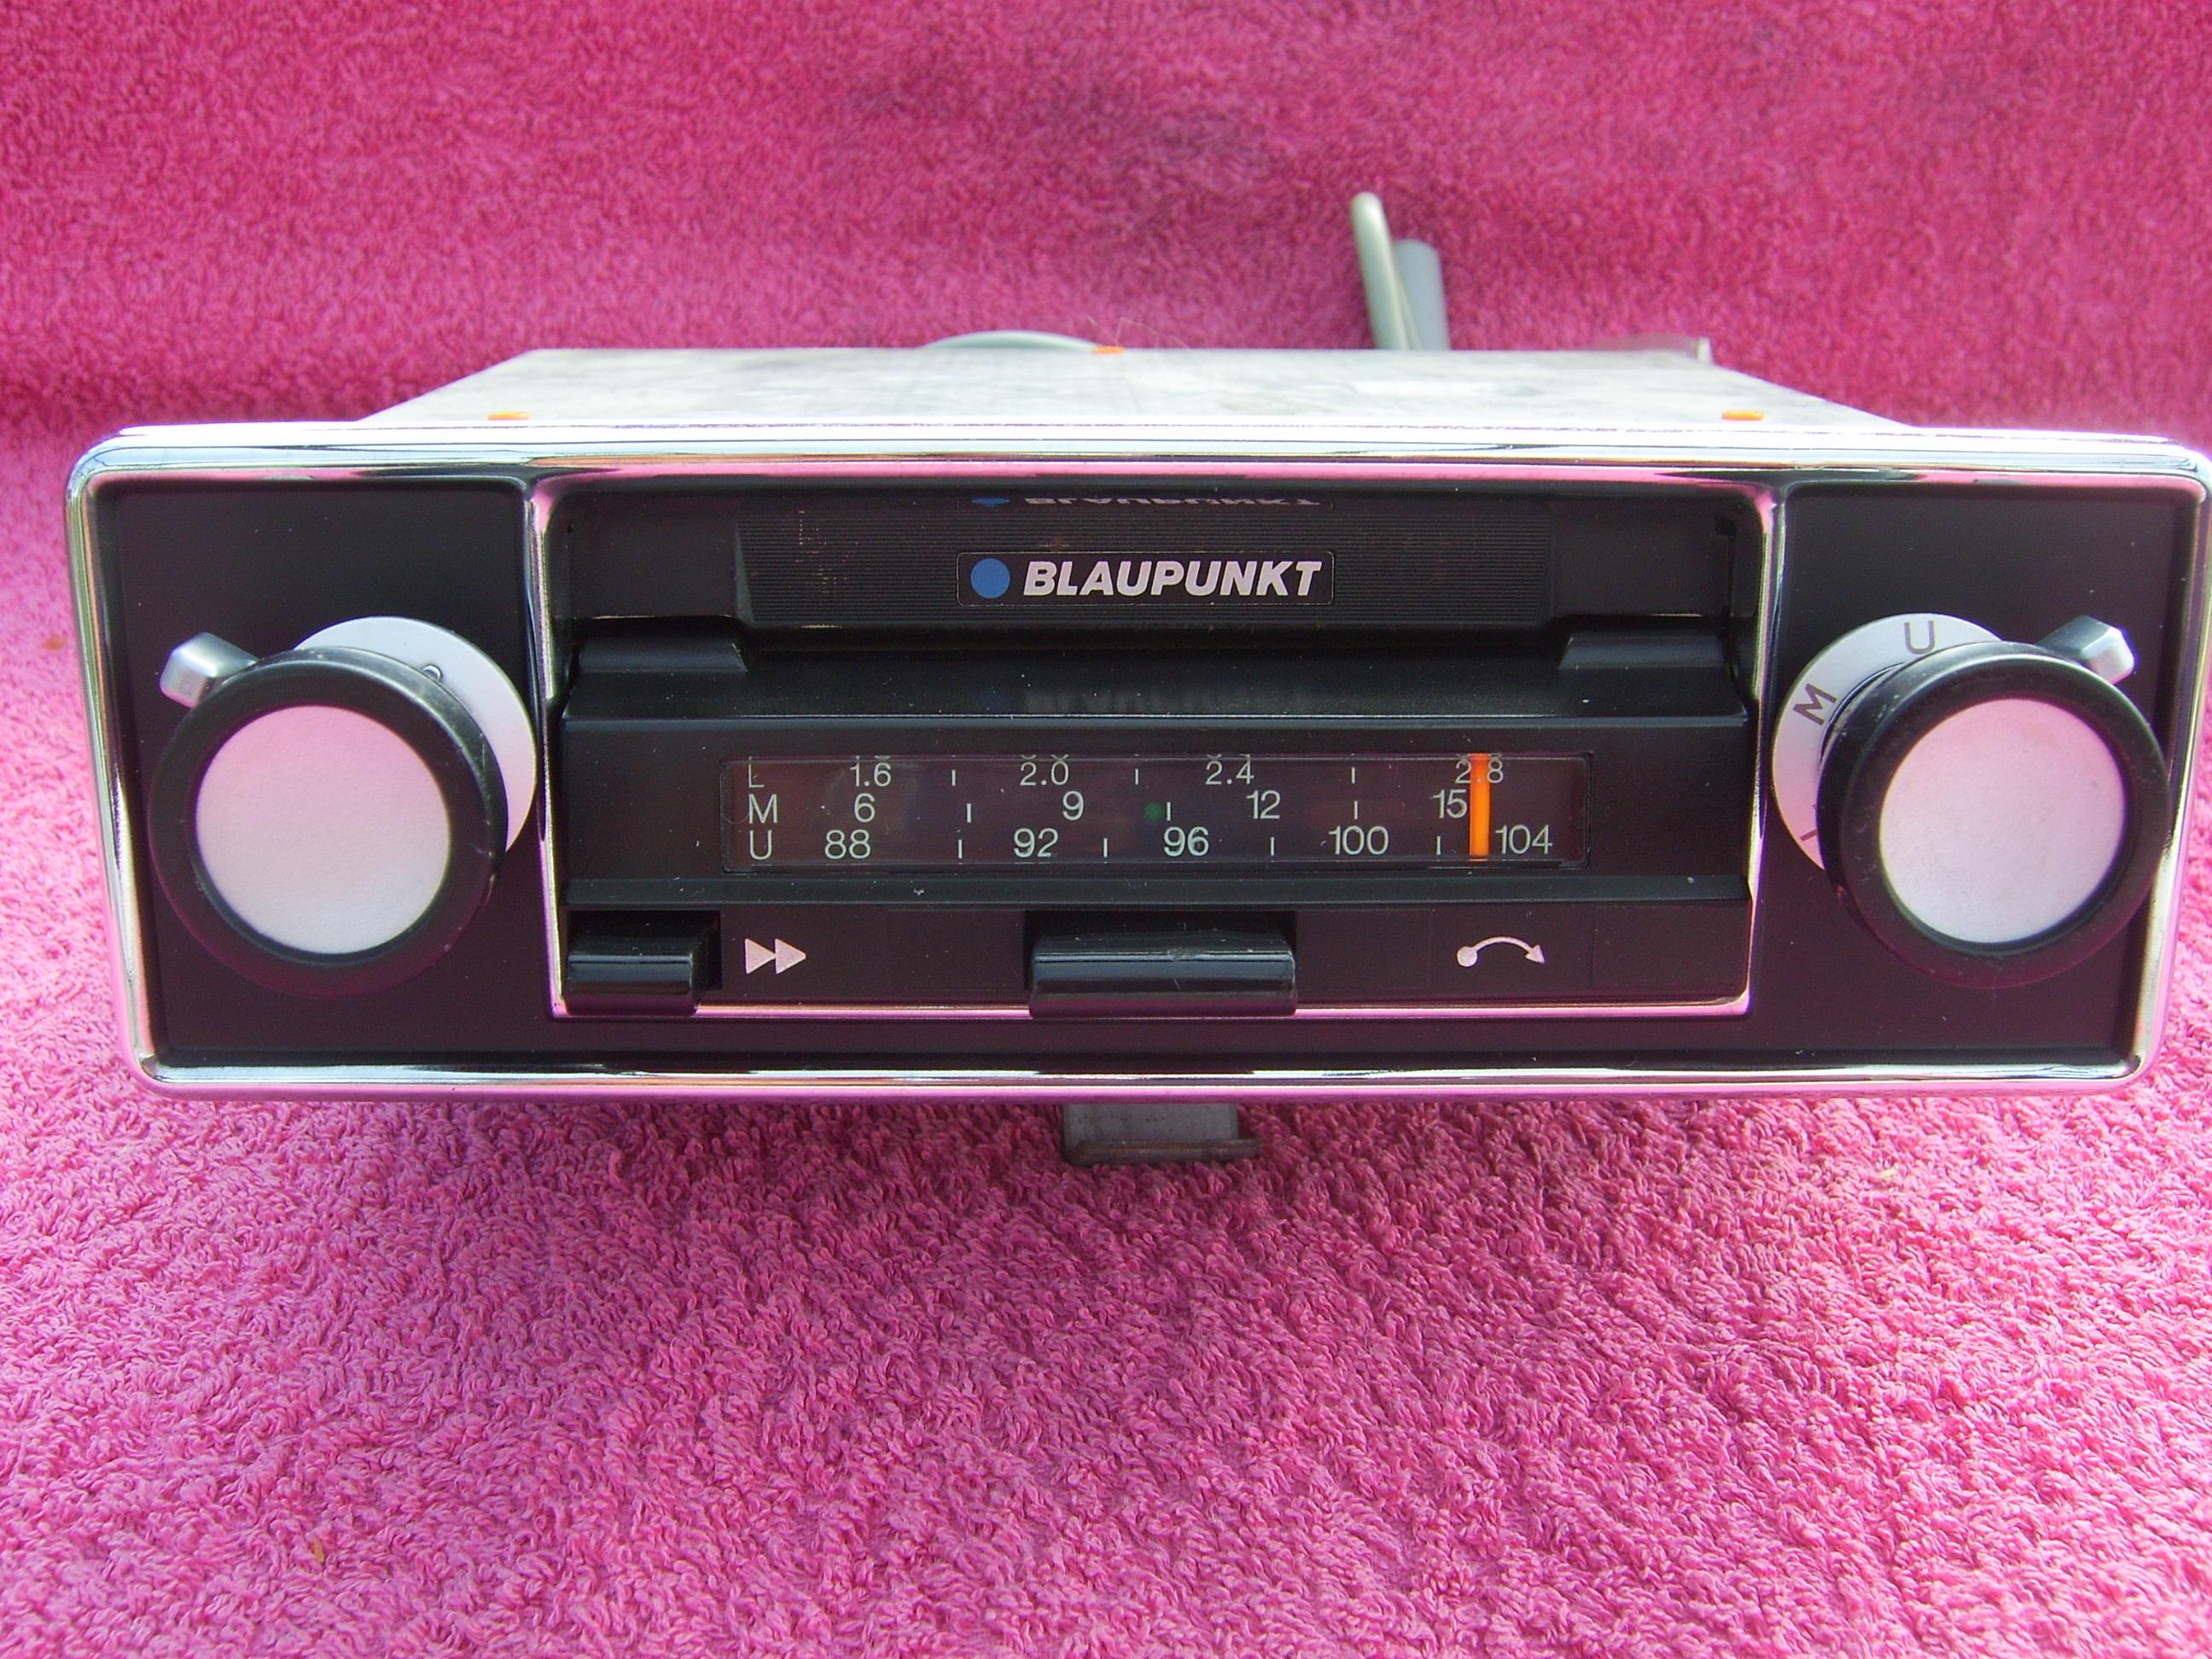 FS: 1973/74 Blaupunkt radio/cassette - Parts For Sale - BMW